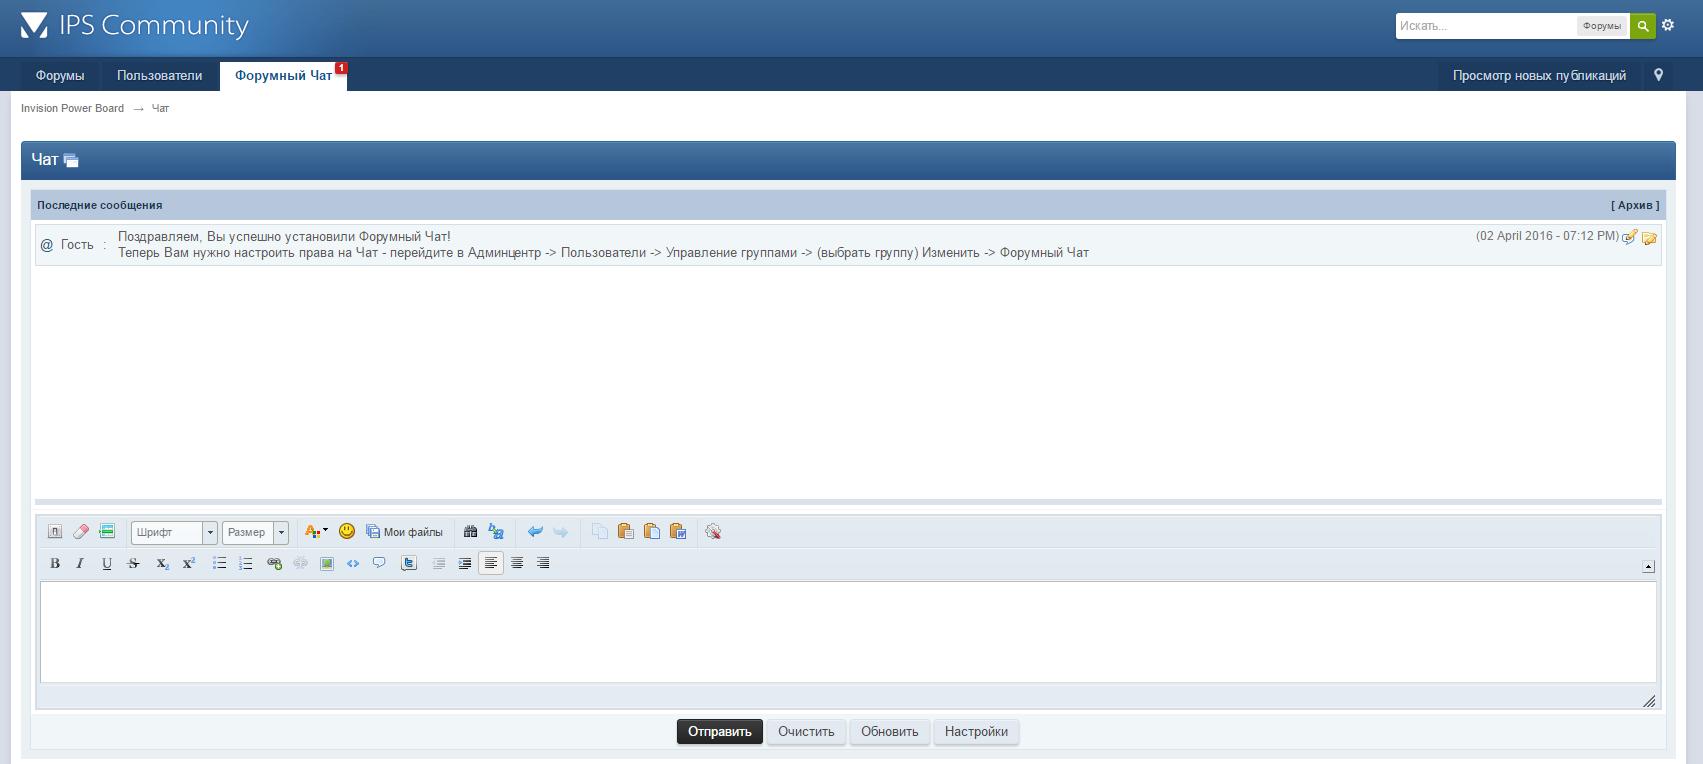 IPB Shoutbox 1.4.2 (Build 2) RUS